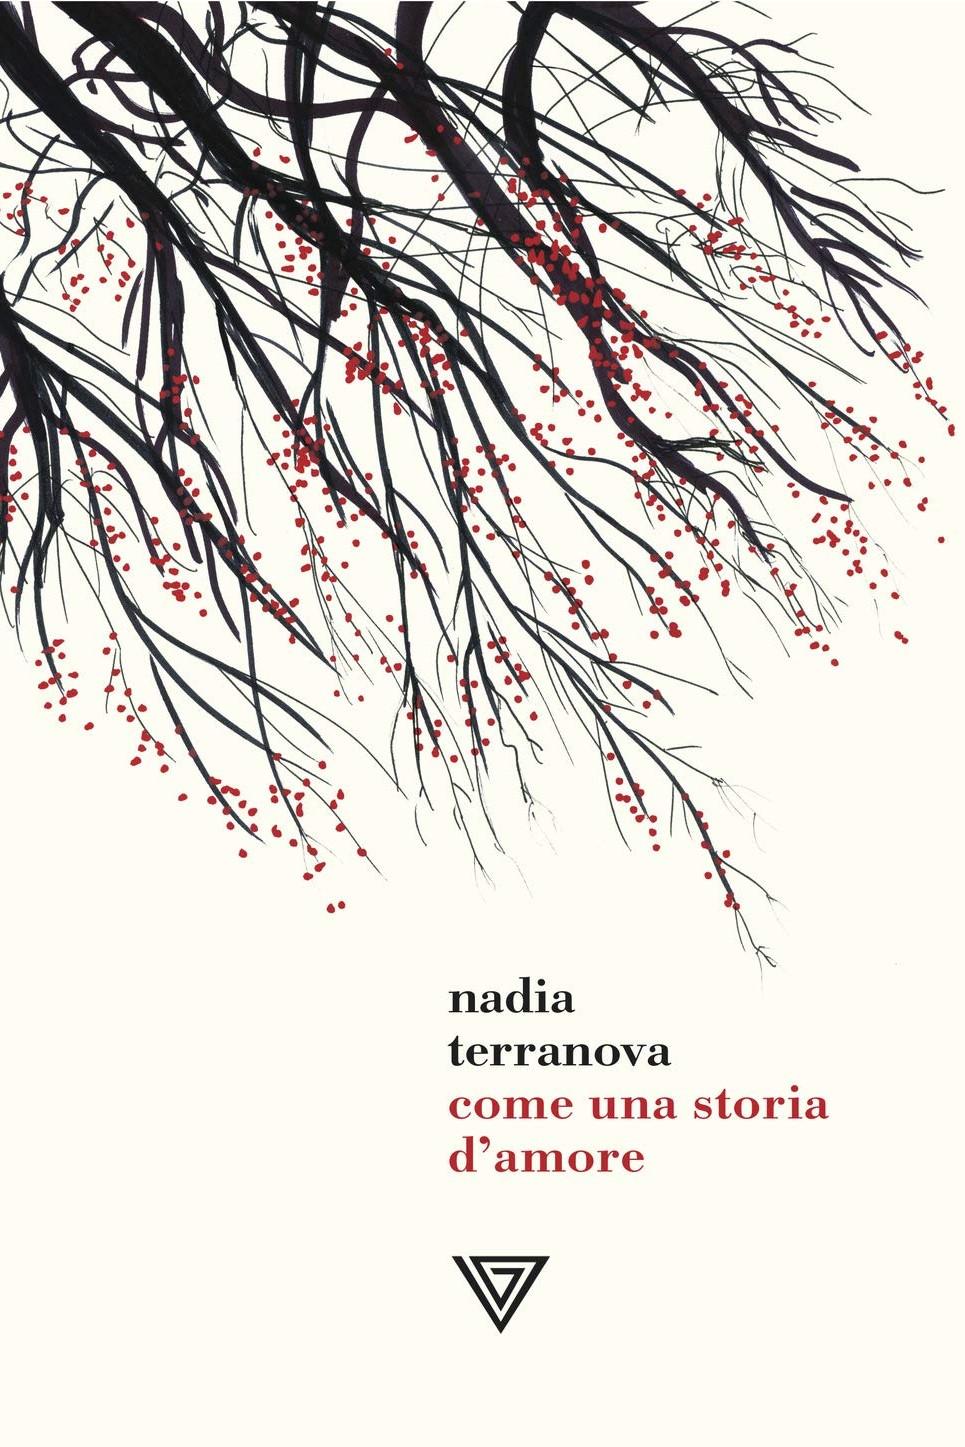 COME UNA STORIA D'AMORE - NADIA TERRANOVA